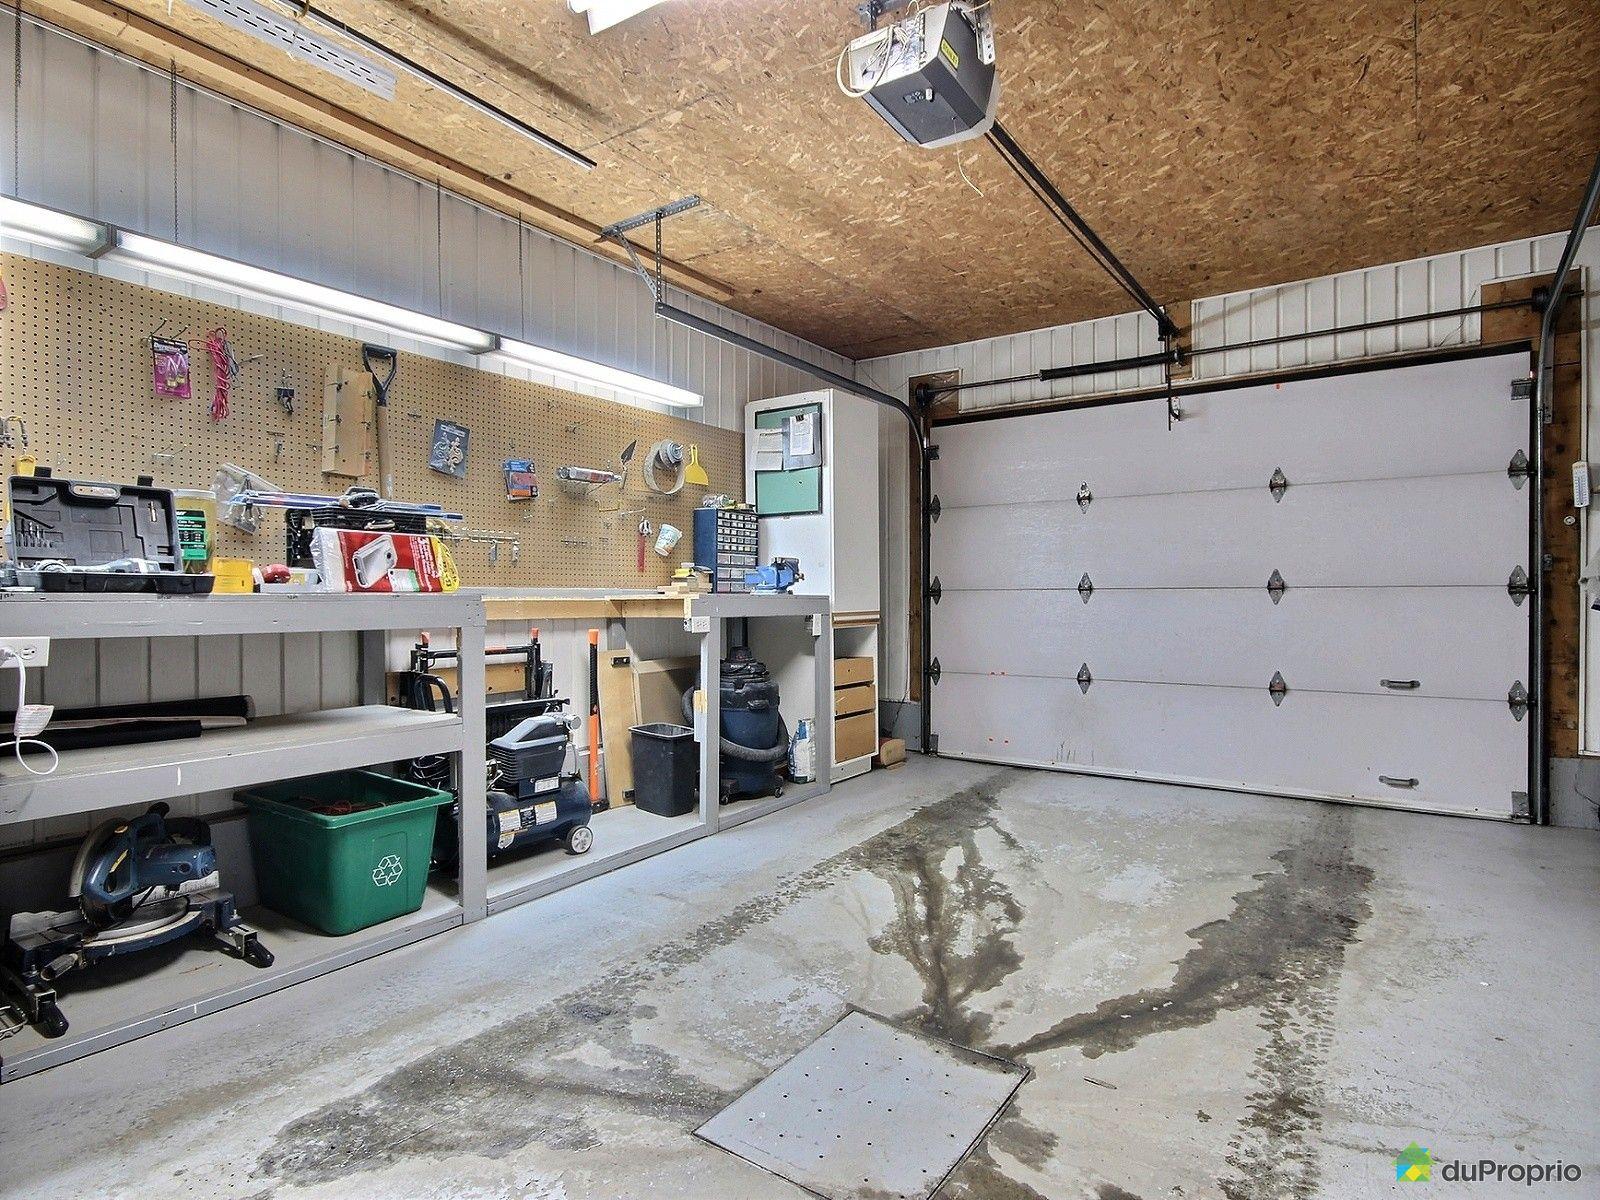 house for sale in cap de la madeleine 1008 rue frontenac duproprio 687658. Black Bedroom Furniture Sets. Home Design Ideas